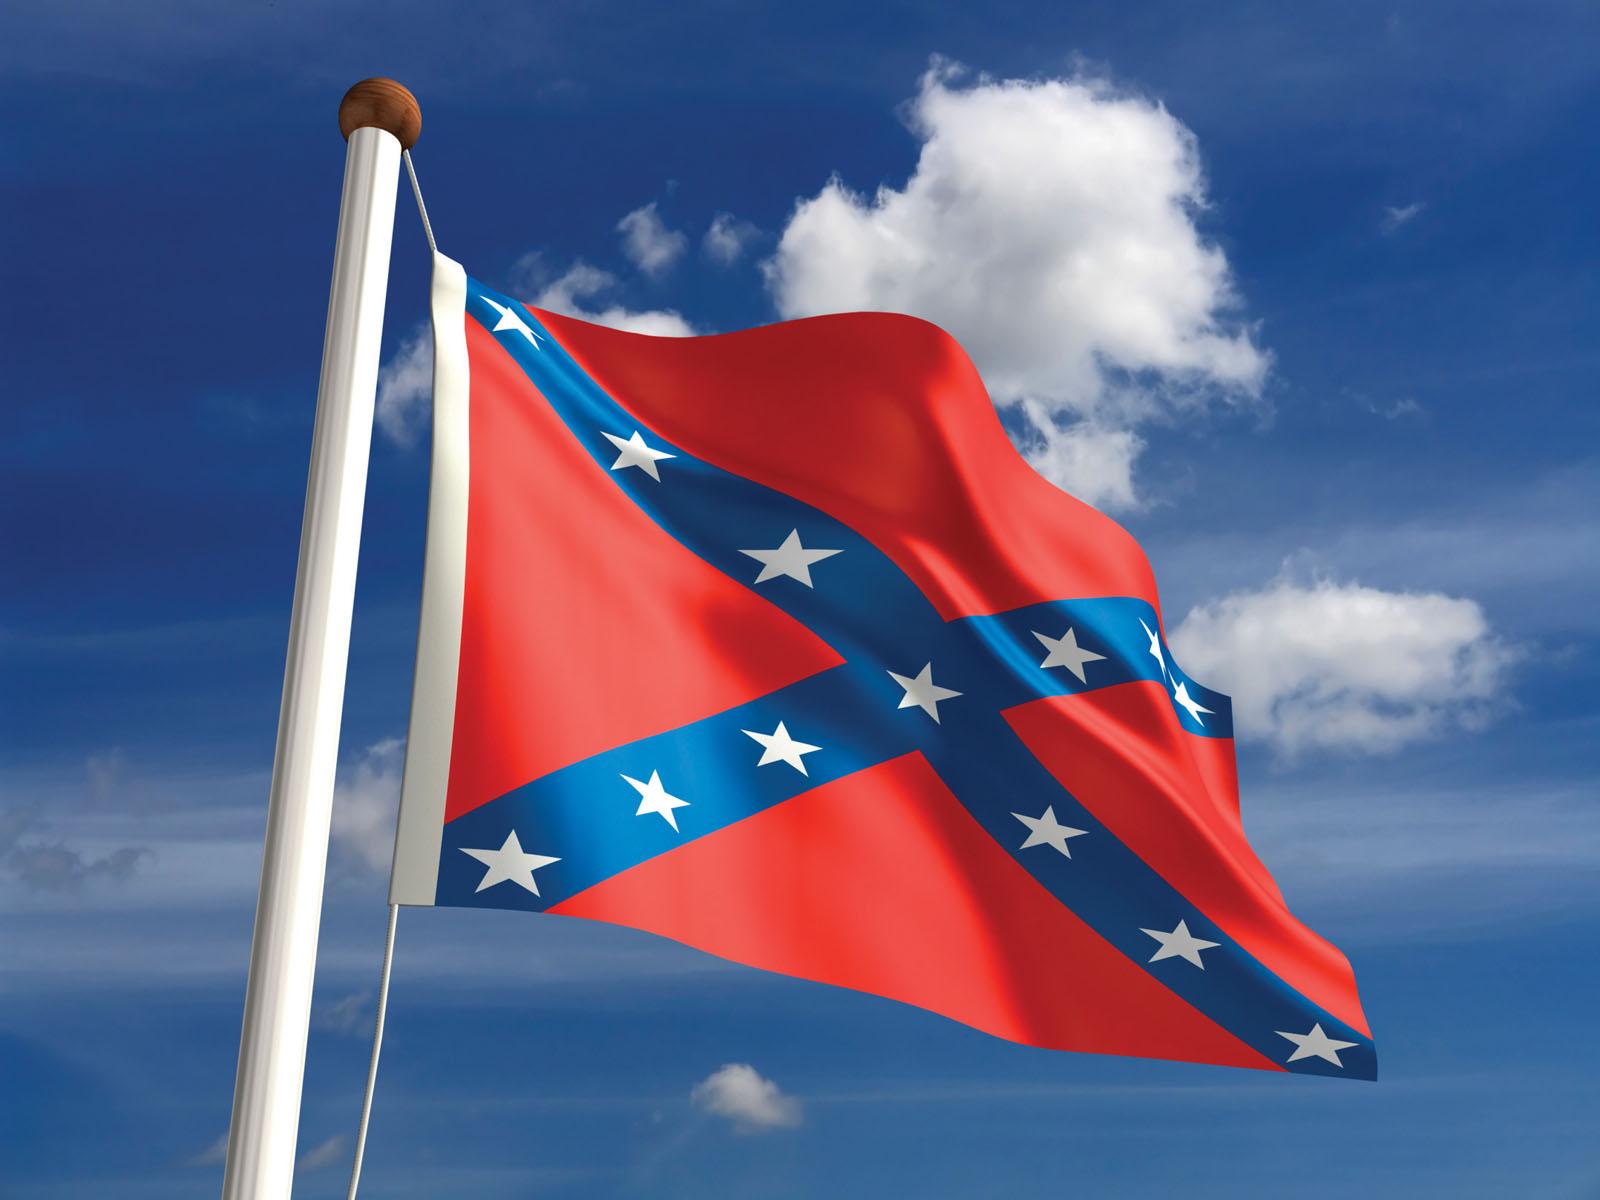 HD Texas Flag Wallpaper  WallpaperSafari